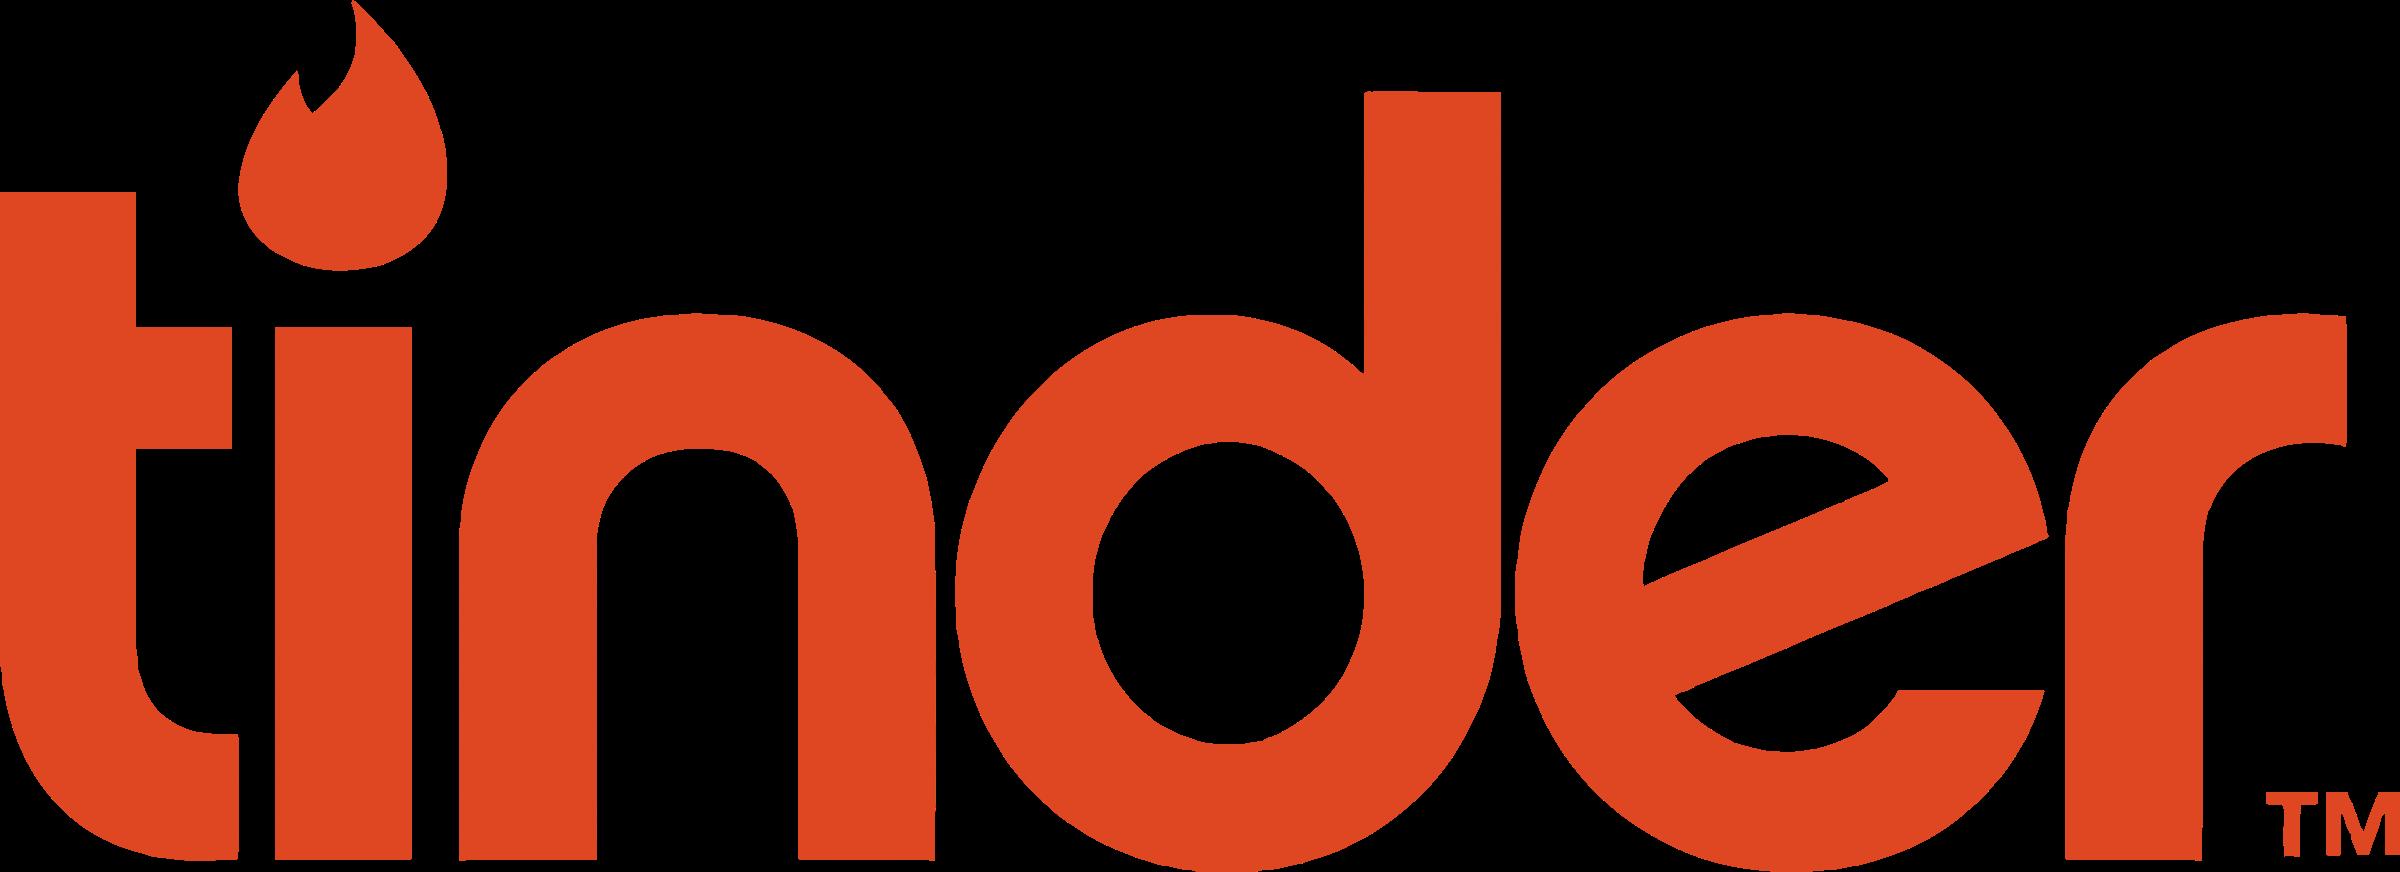 Tinder Logo.png